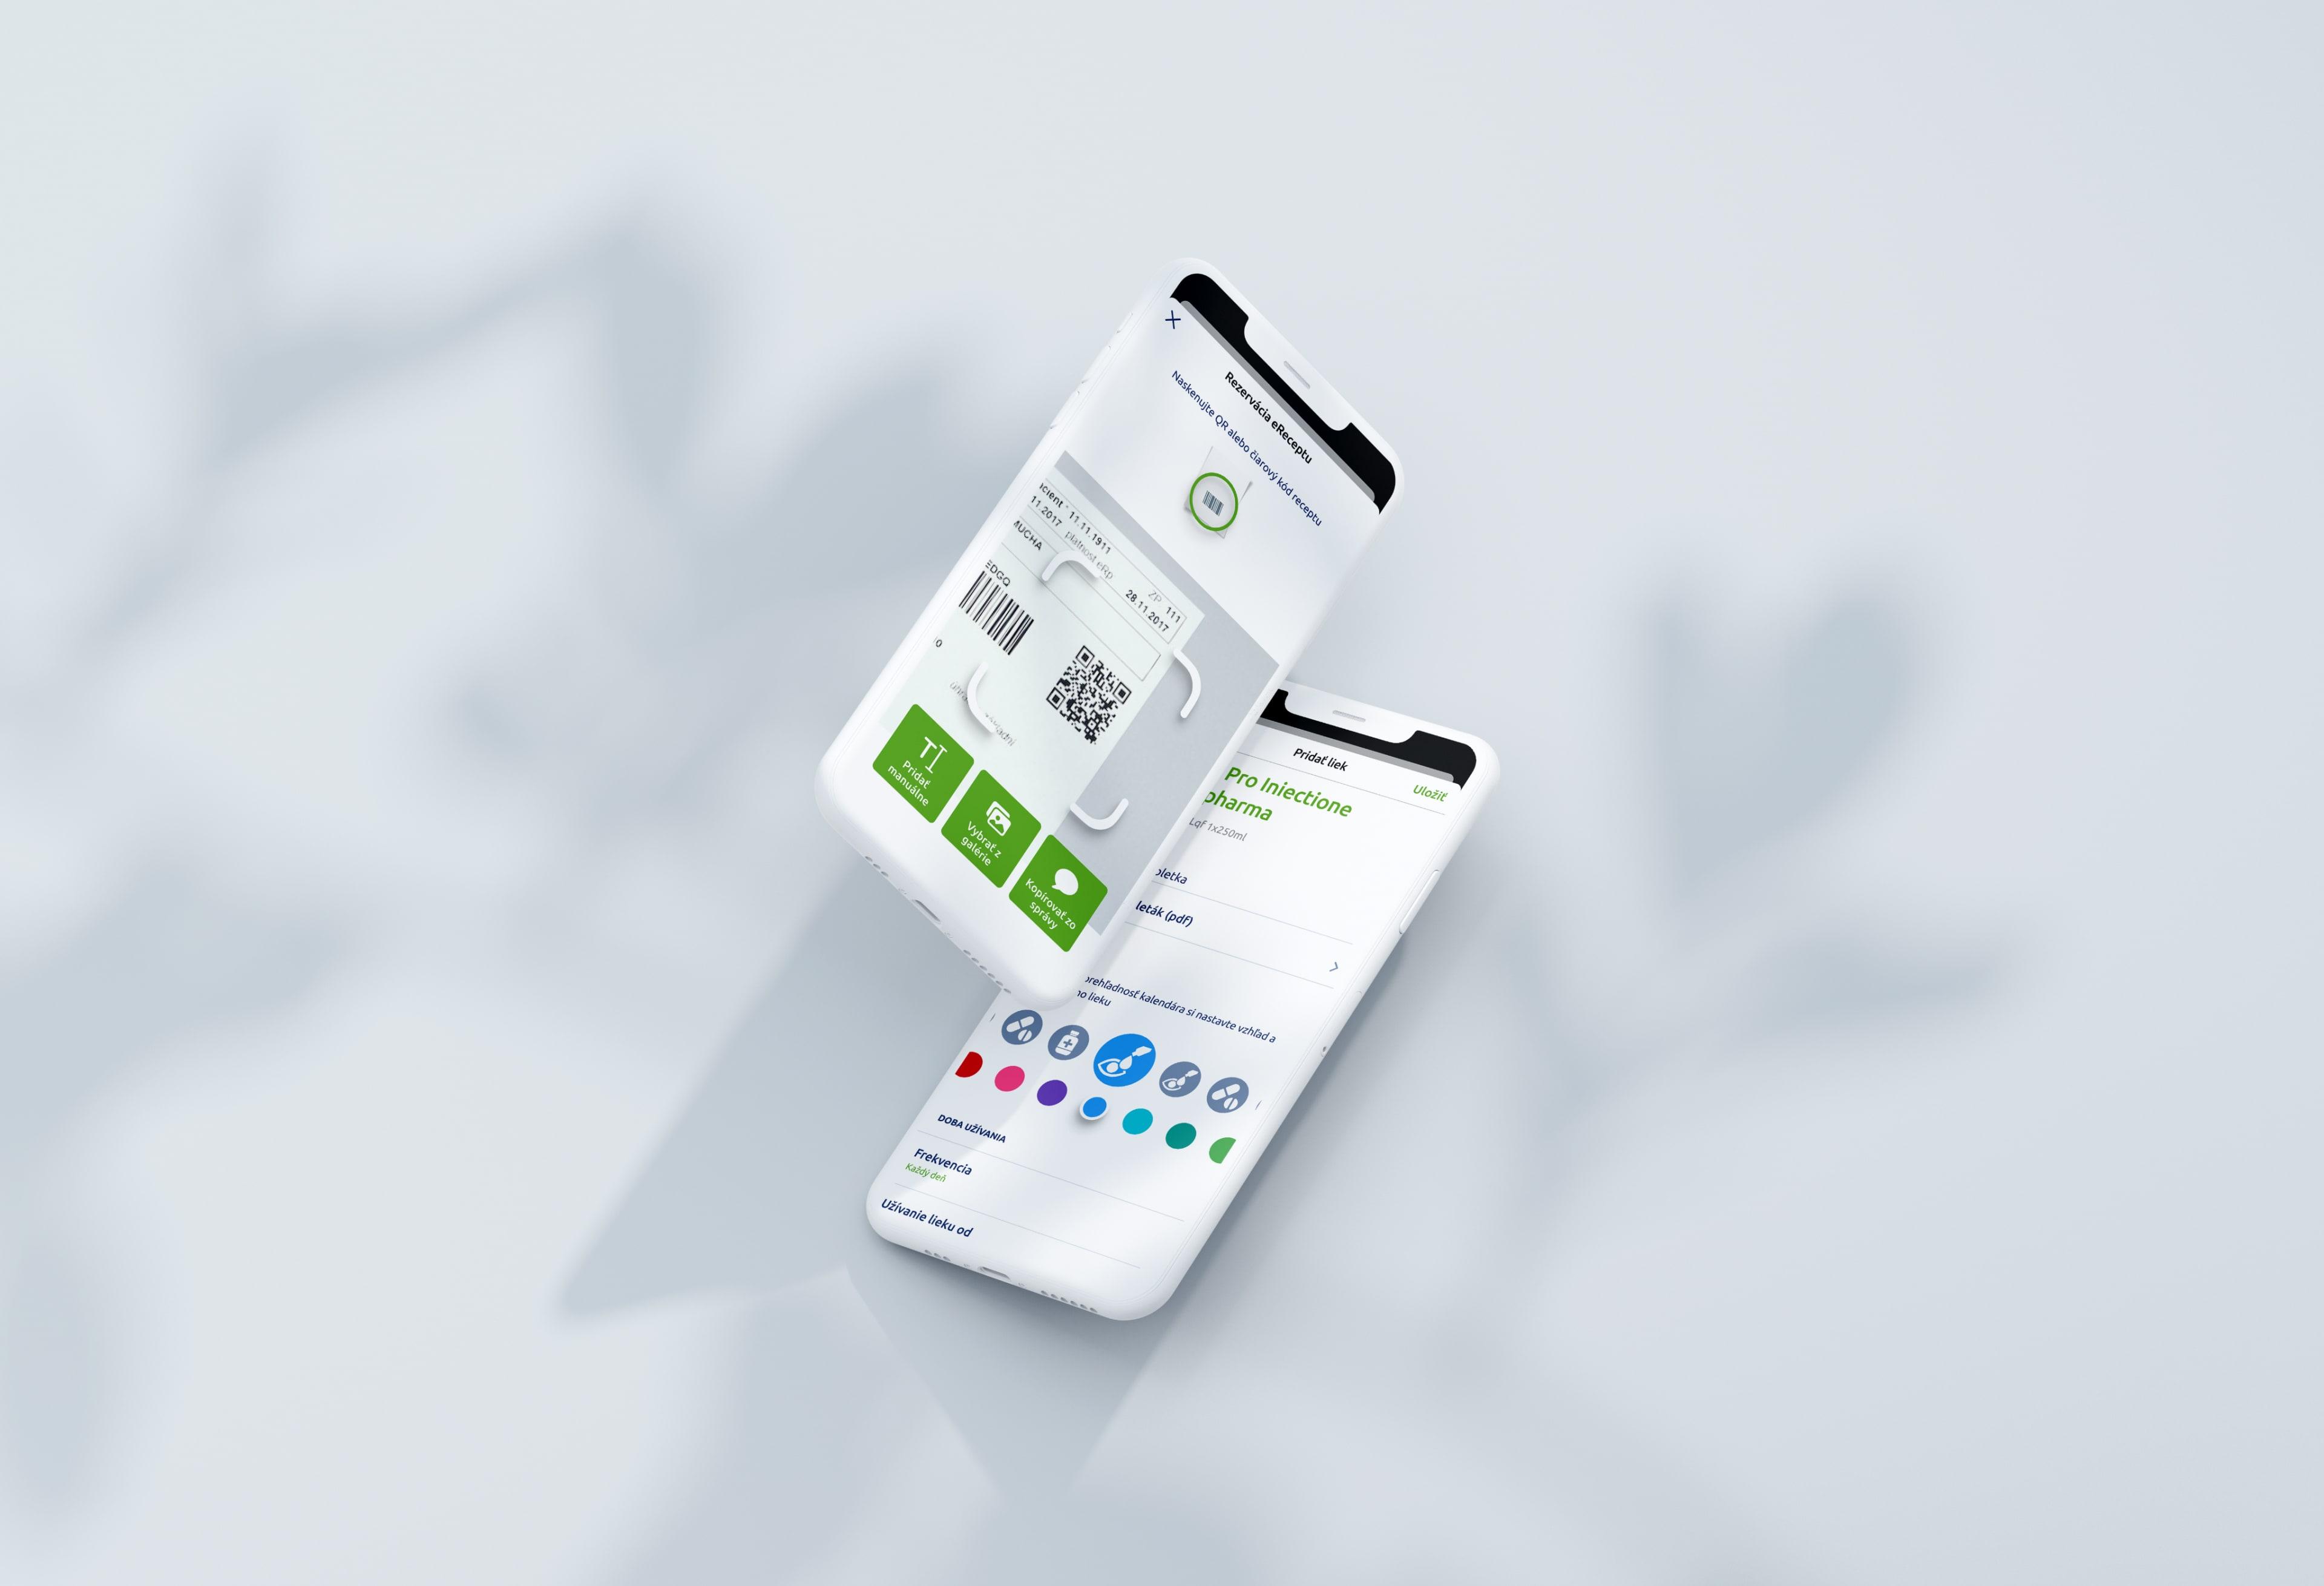 Inovácie online lekární s našim partnerom BENU